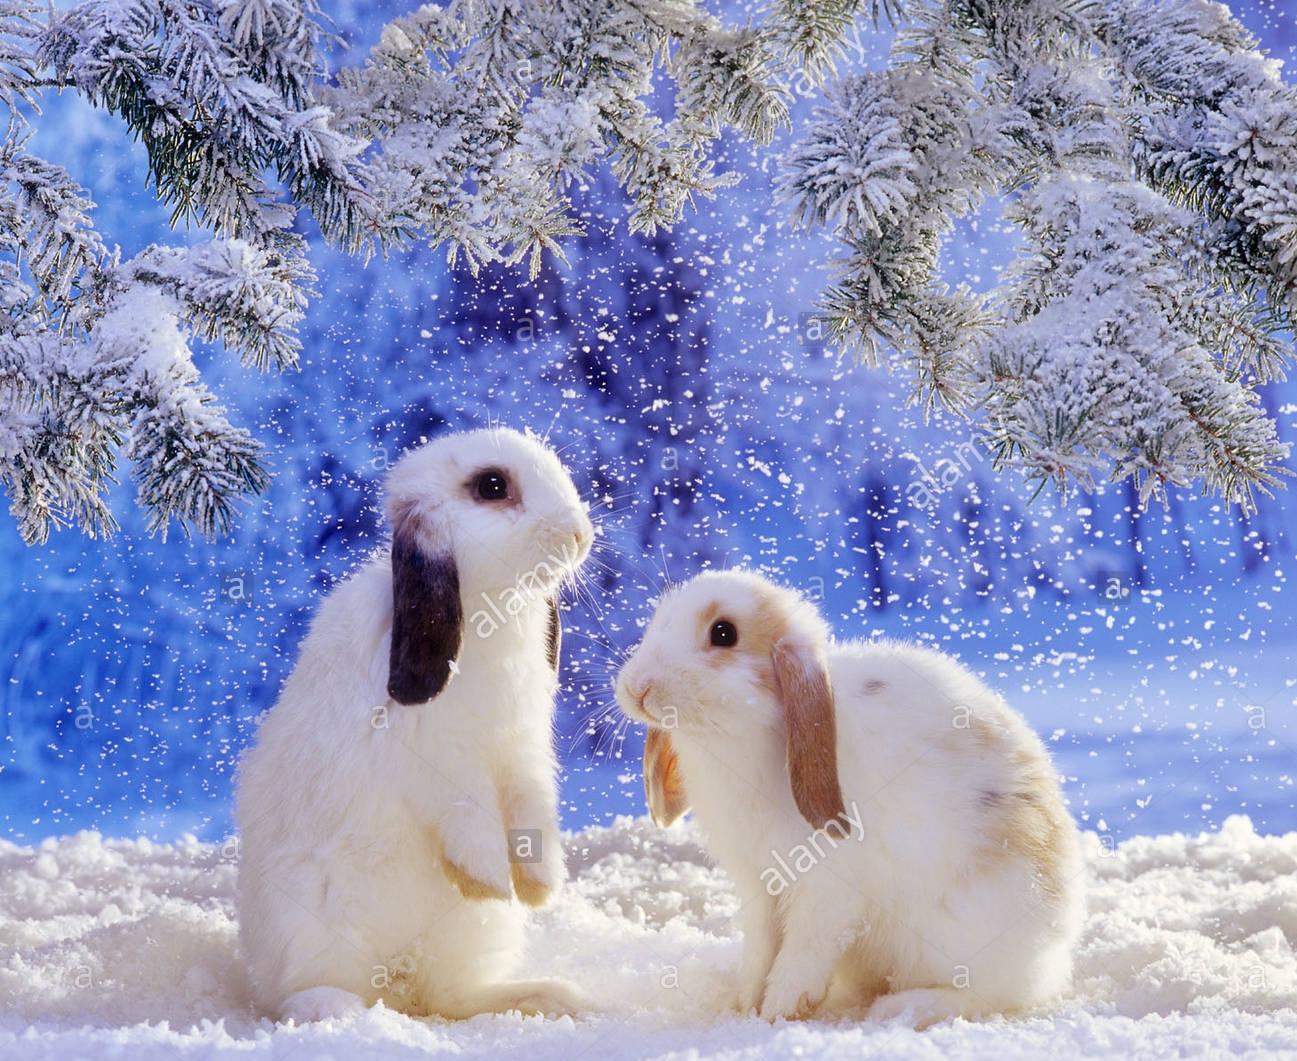 two-lop-eared-dwarf-rabbits-in-snow-AC826Y.jpg